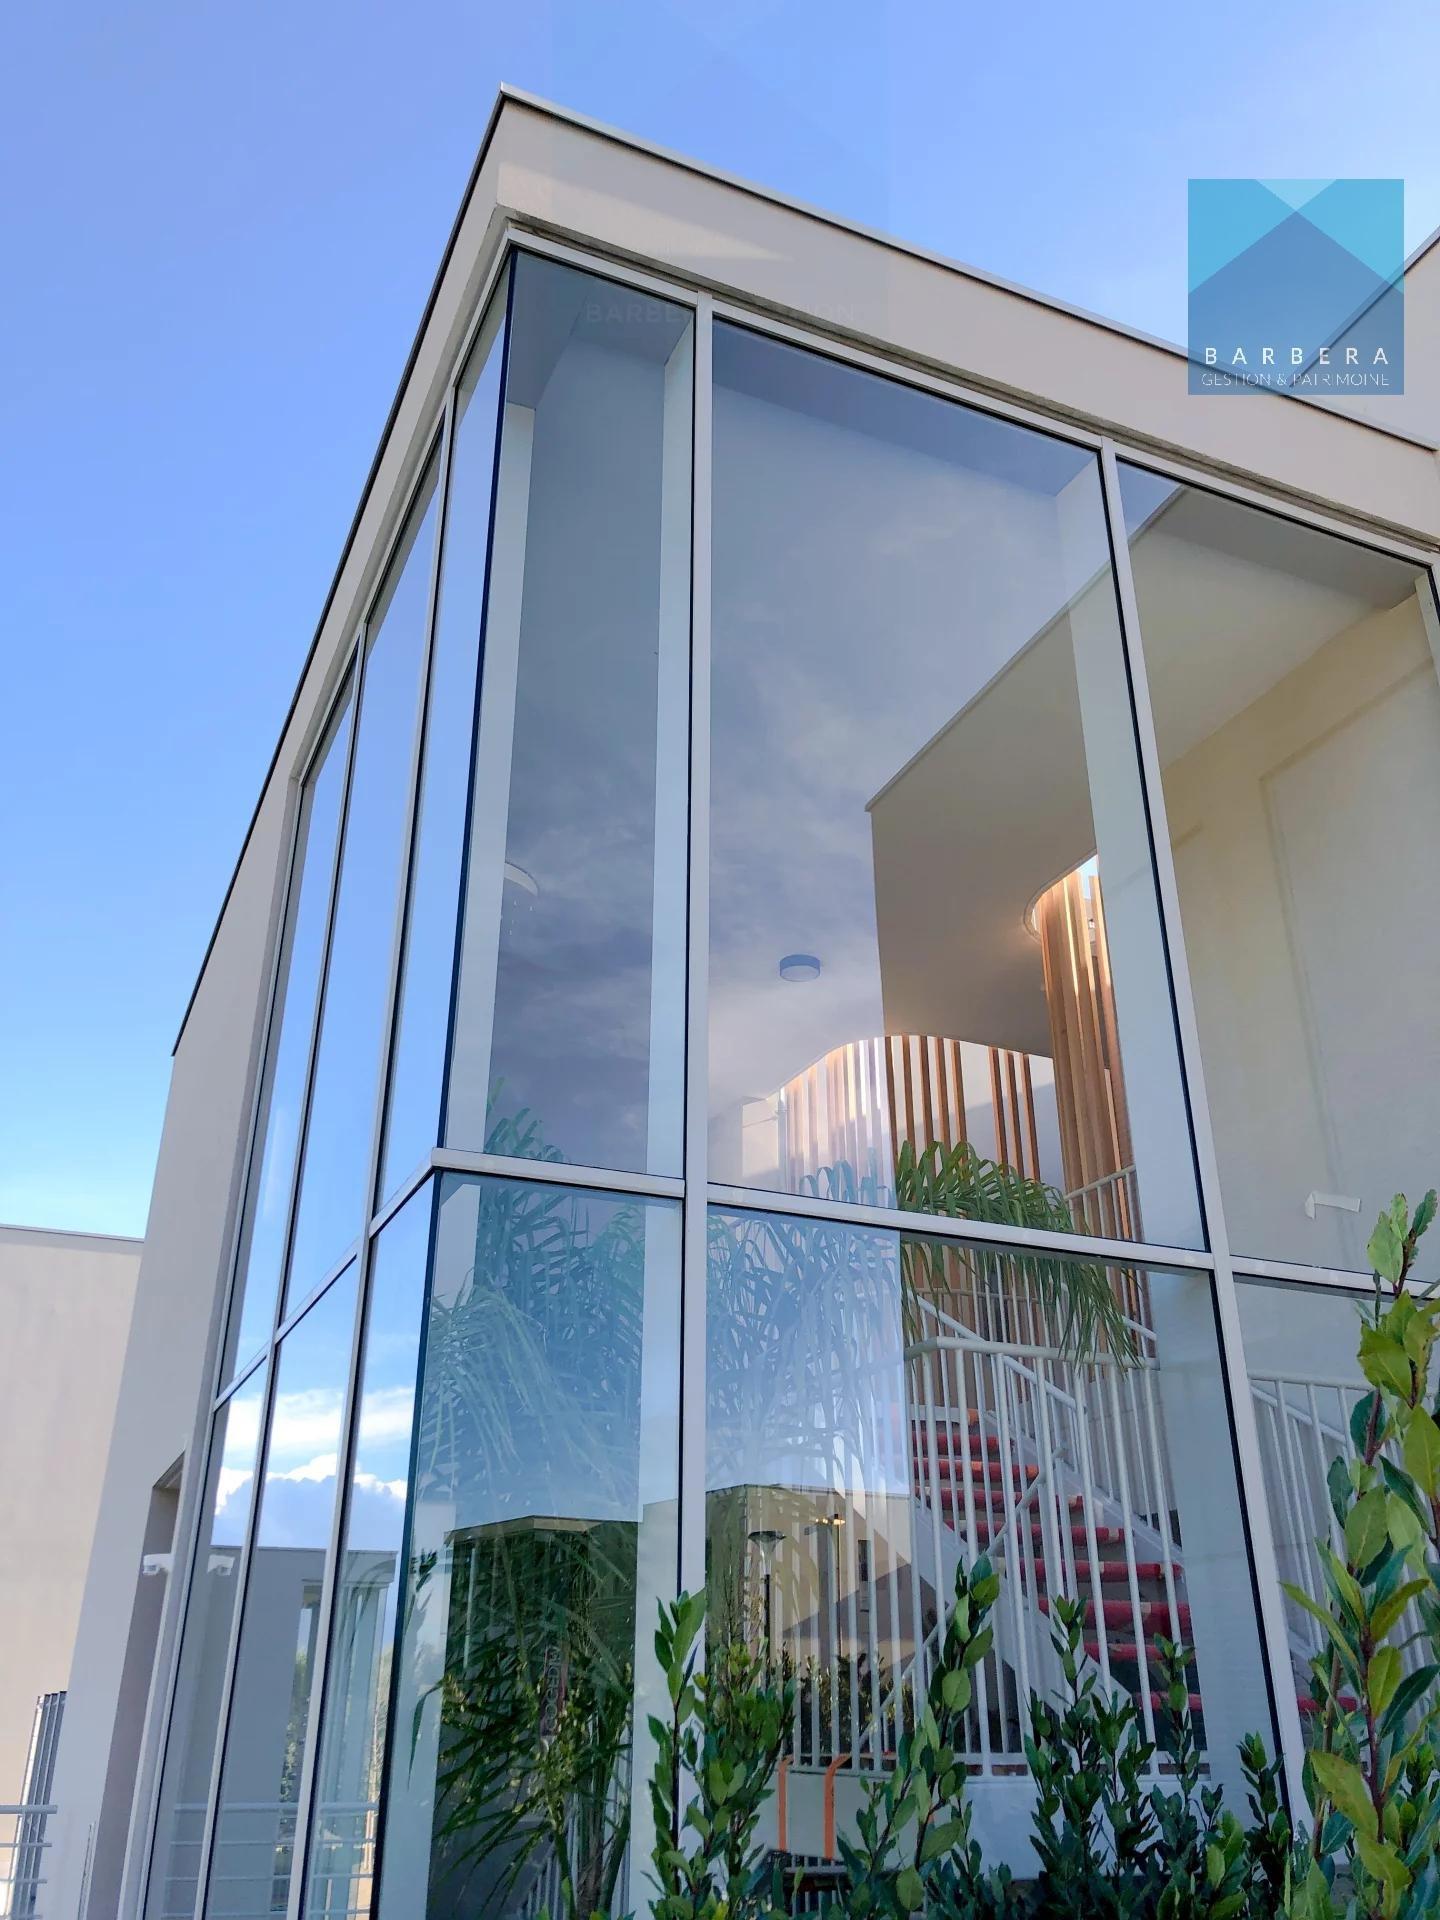 Vente appartement 129 m²